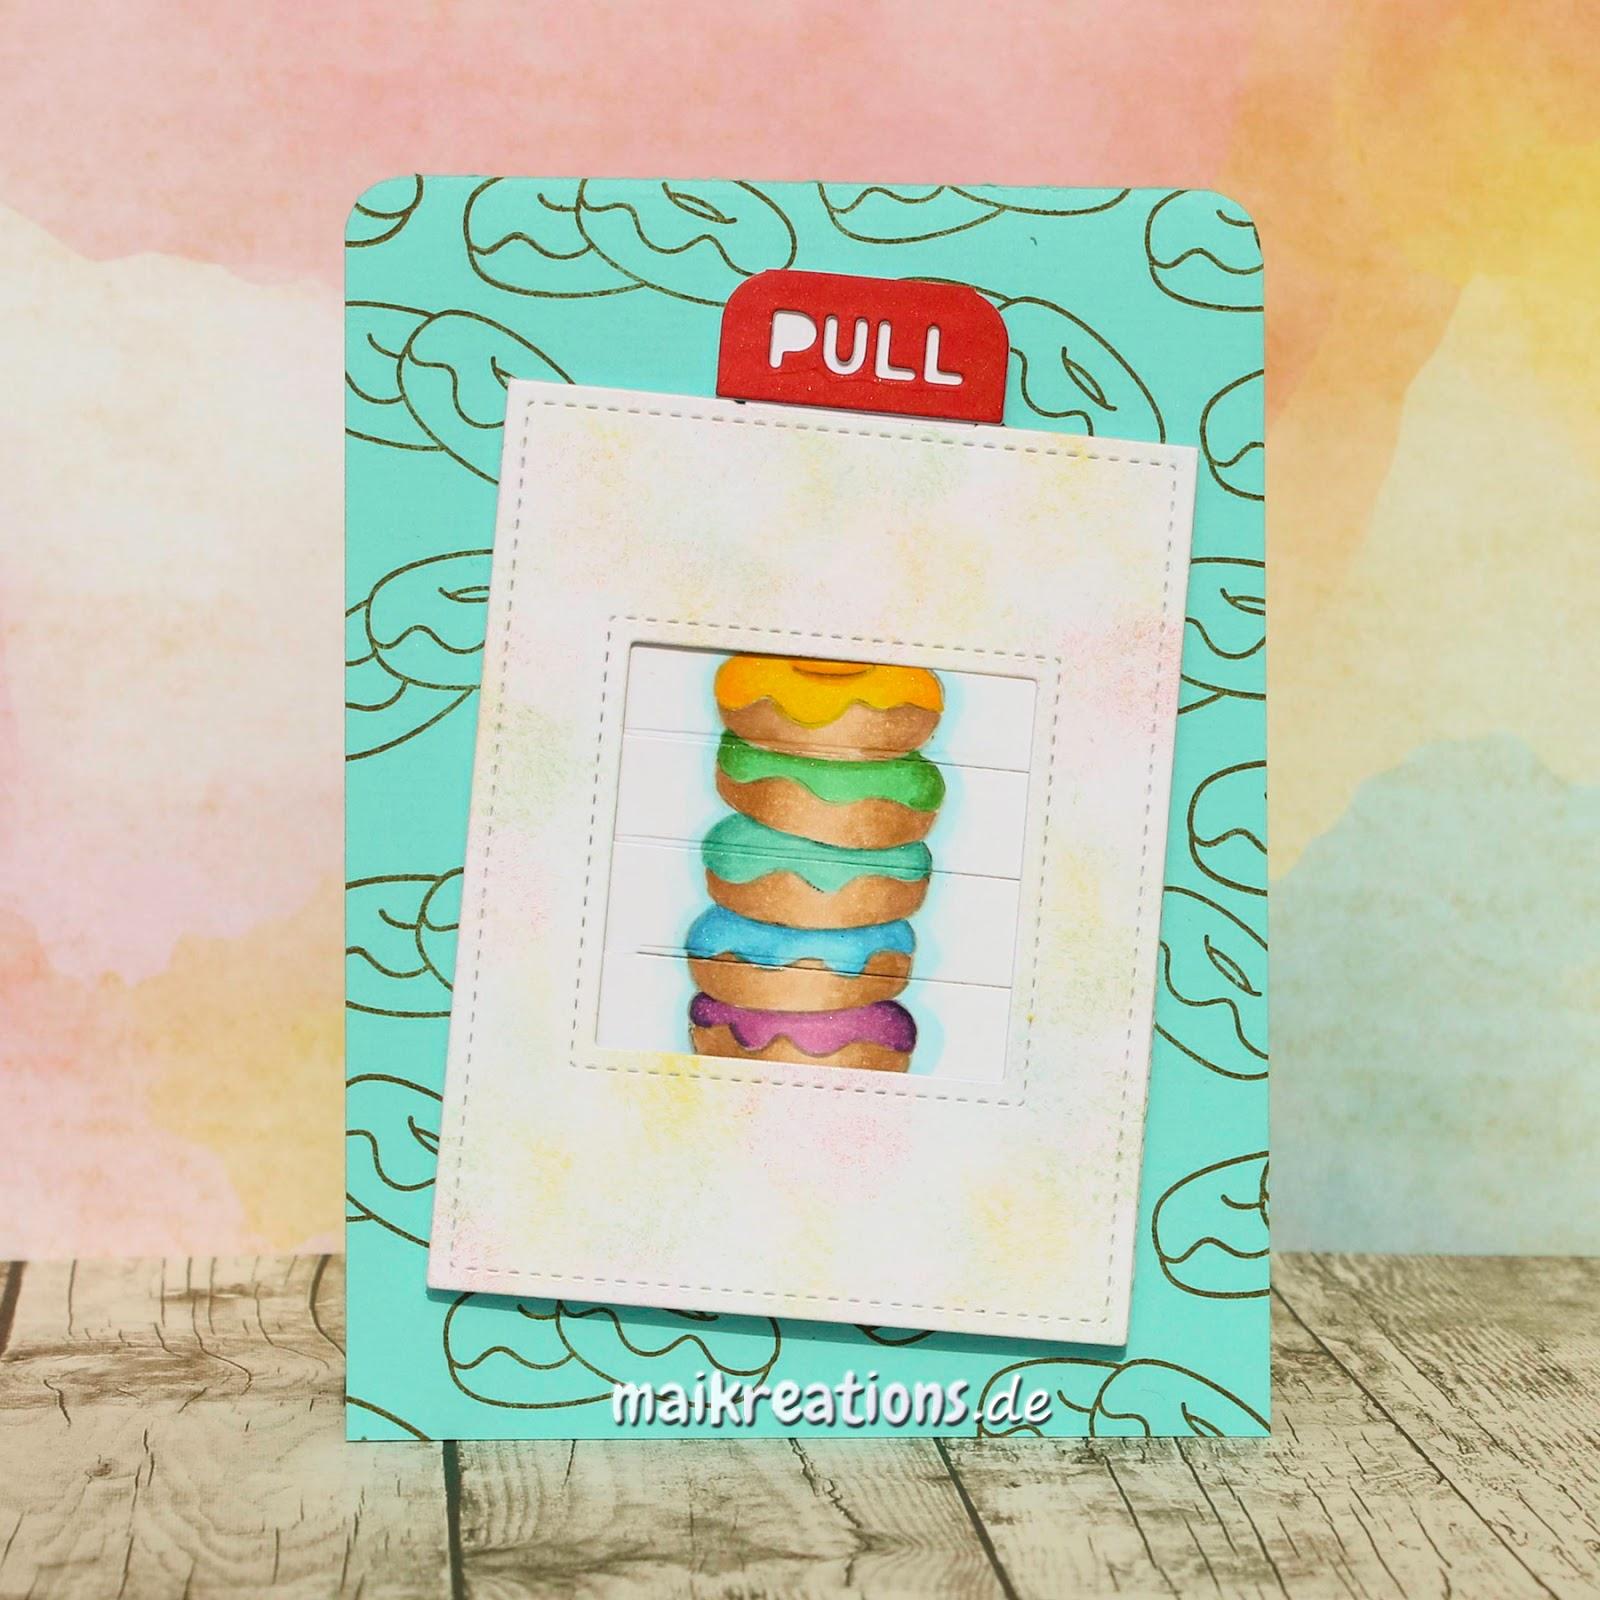 maikreations interactive birthday card with donut treats